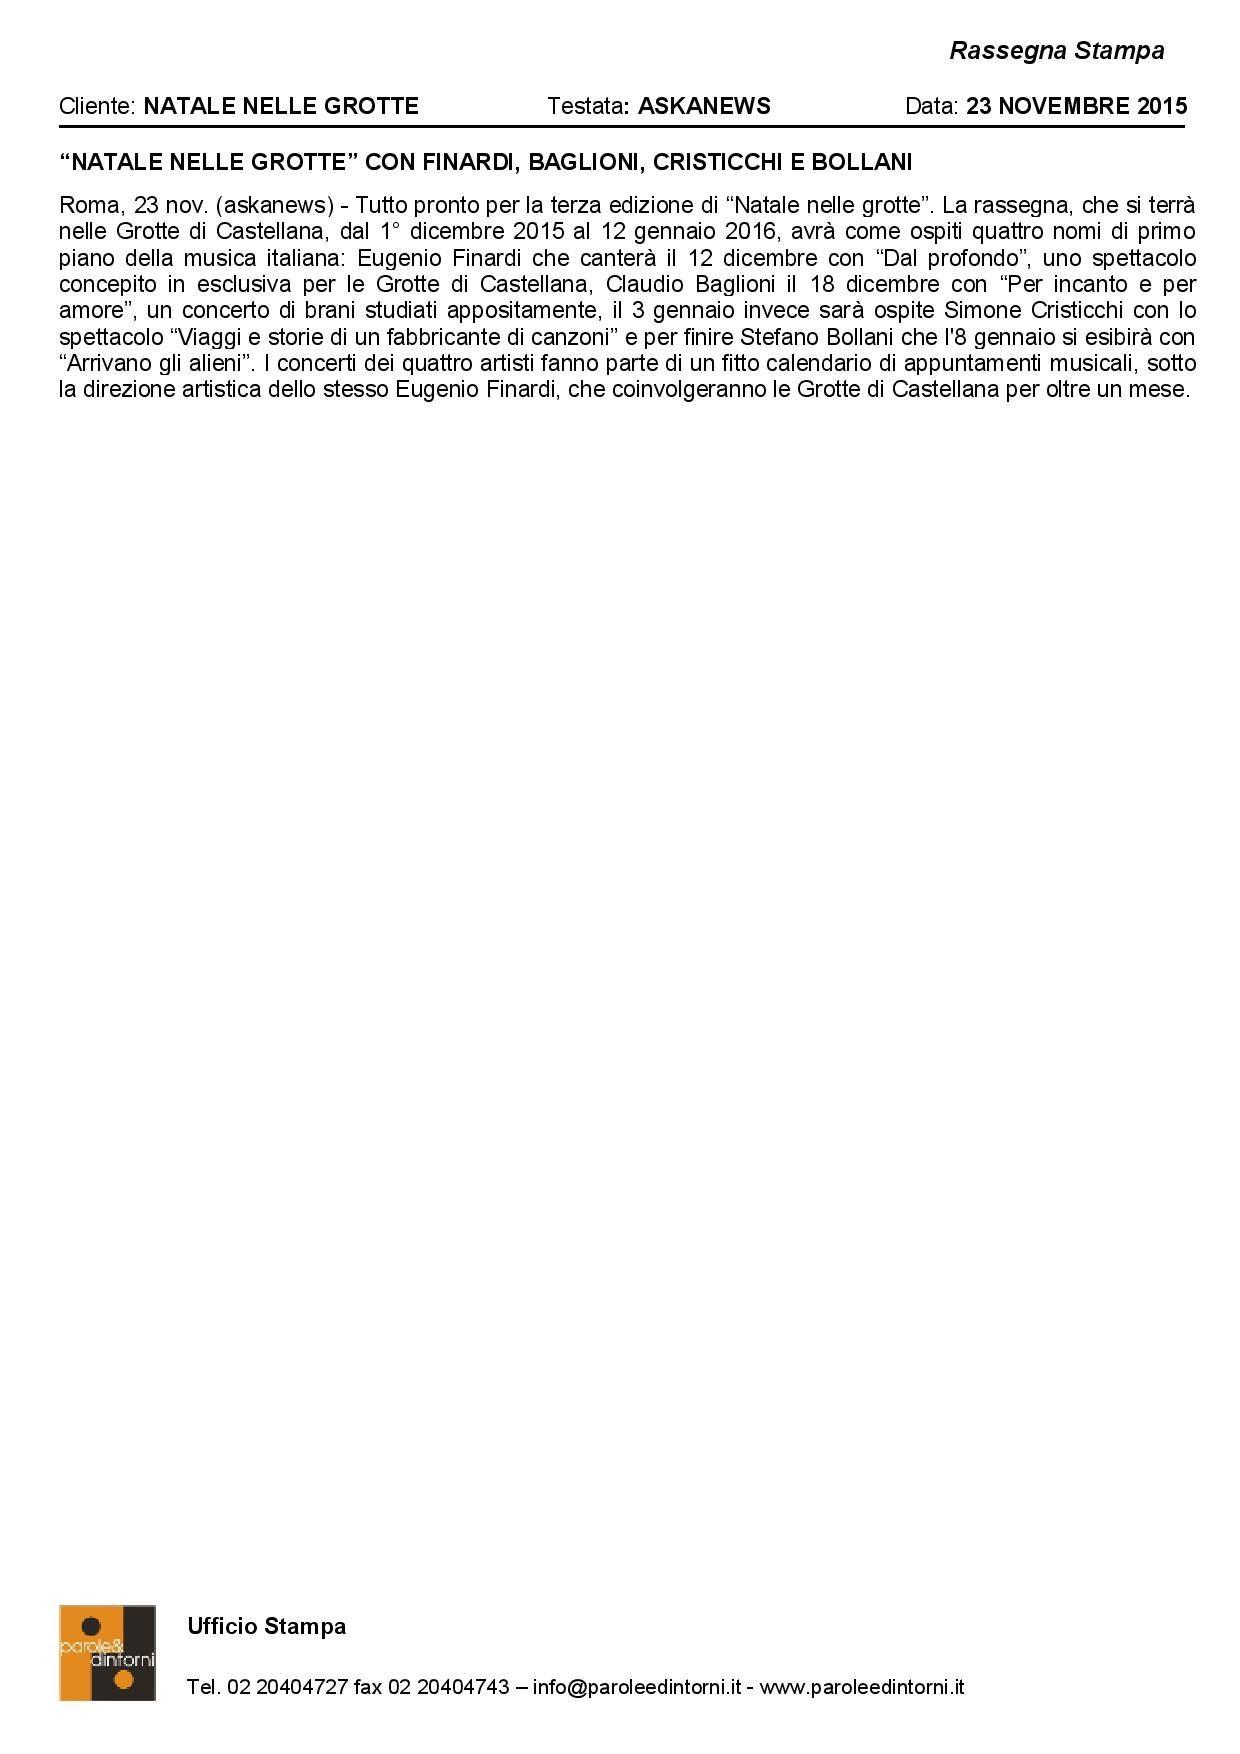 20151123_Askanews_Natale nelle Grotte(1)-page-001